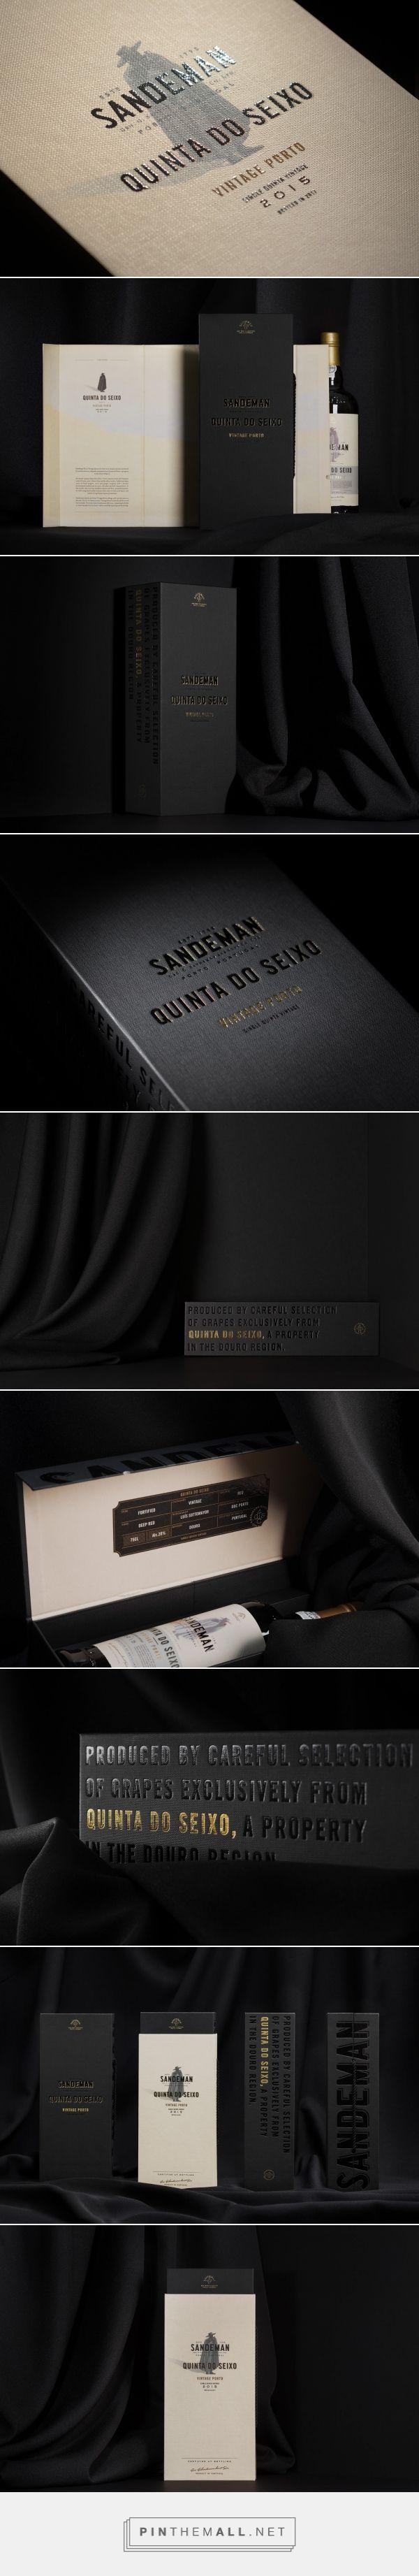 Quinta do Seixo Single Estate Vintage giftbox packaging design by VOLTA - http://www.packagingoftheworld.com/2017/11/quinta-do-seixo-single-estate-vintage.html